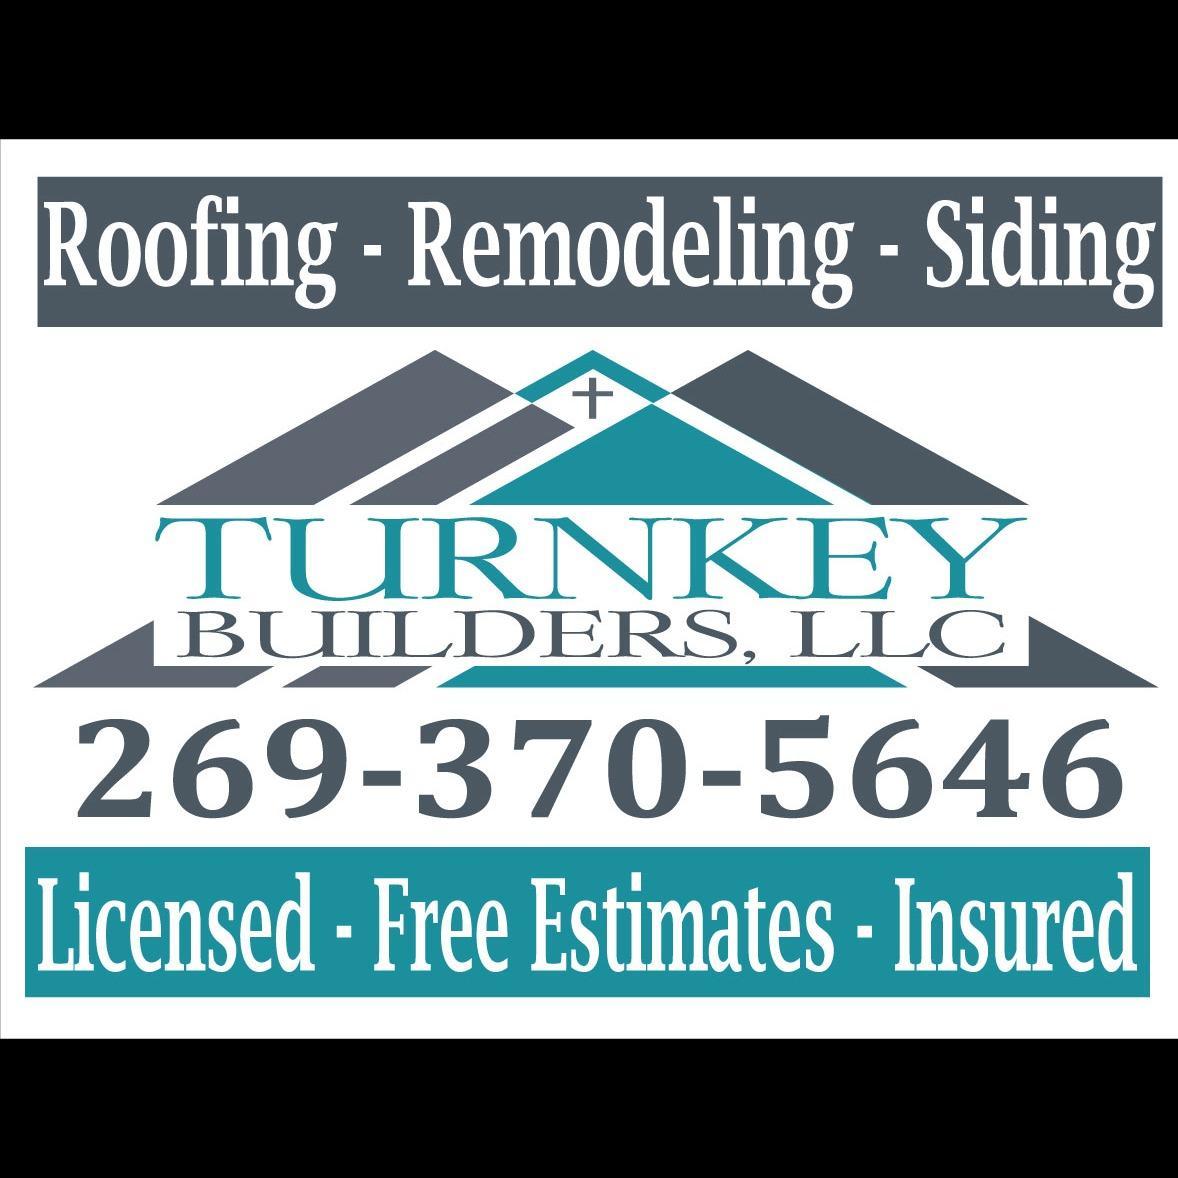 Turnkey Builders LLC